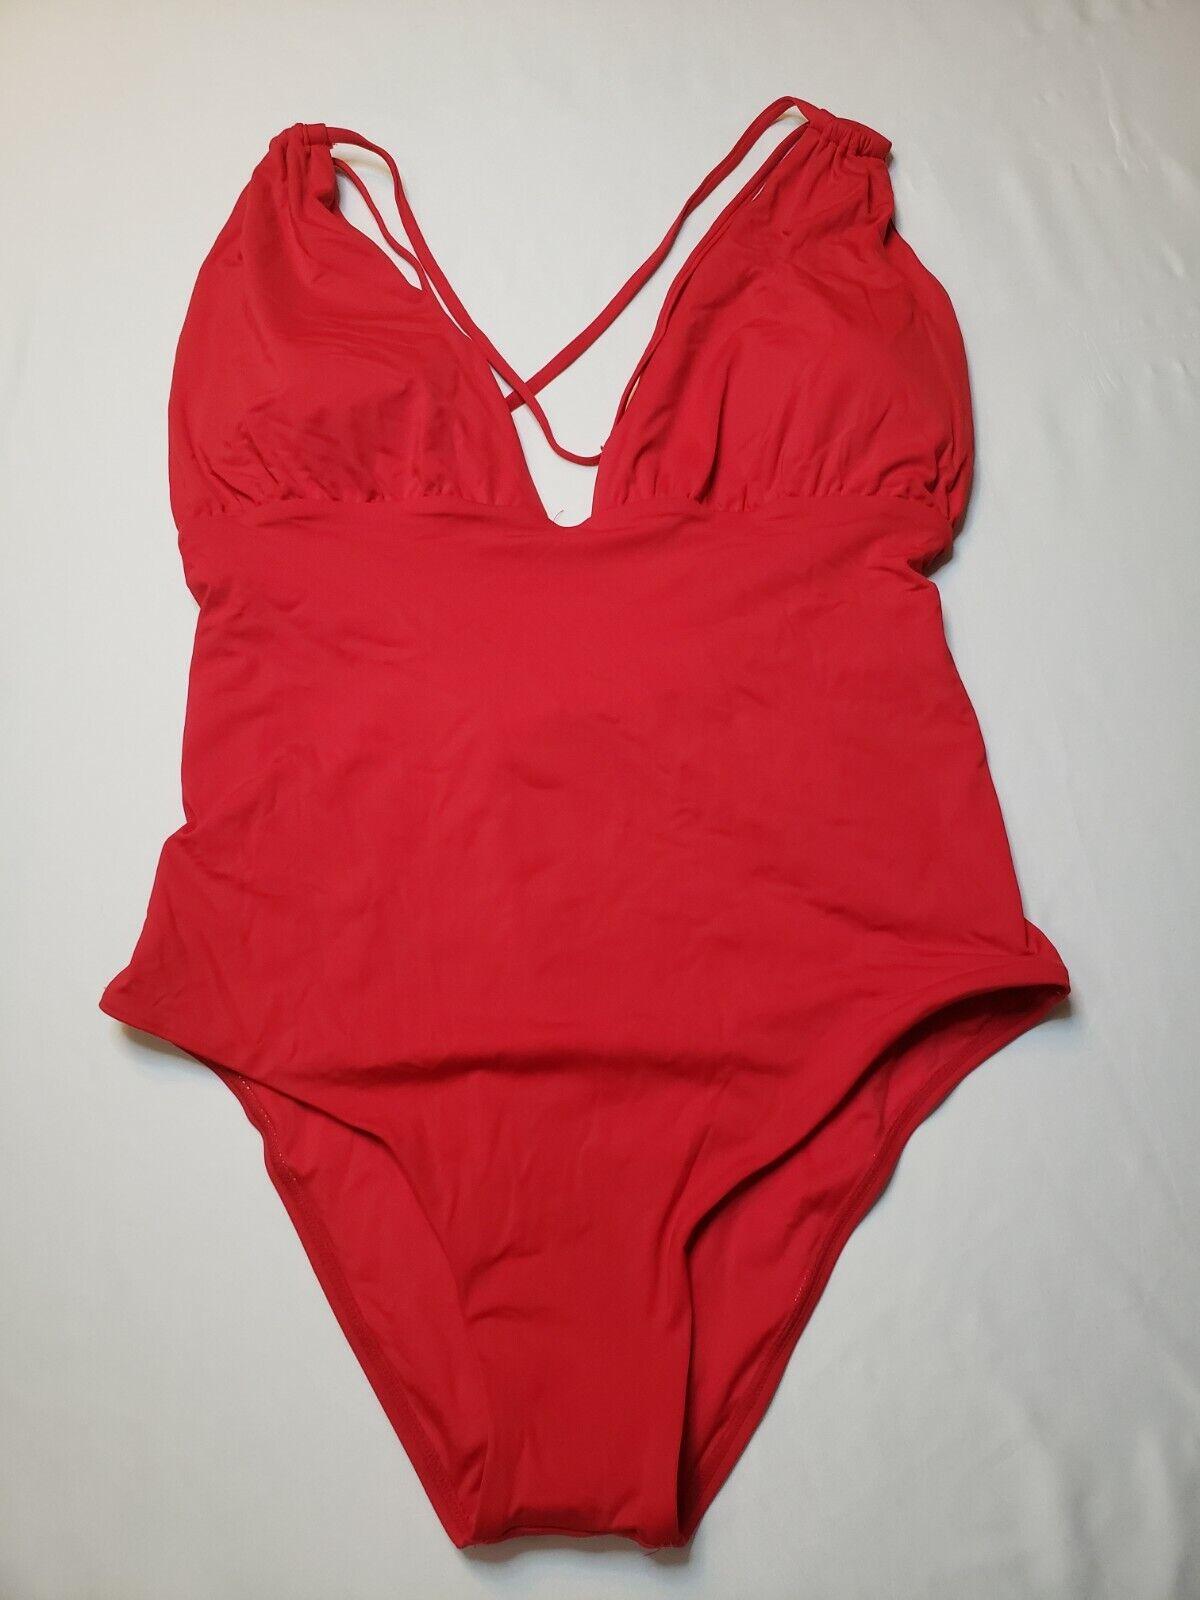 Sunn Lab Swim Cherry Red Medium Coverage 1 Piece Swim Suit Size L Gorgeous - $13.99